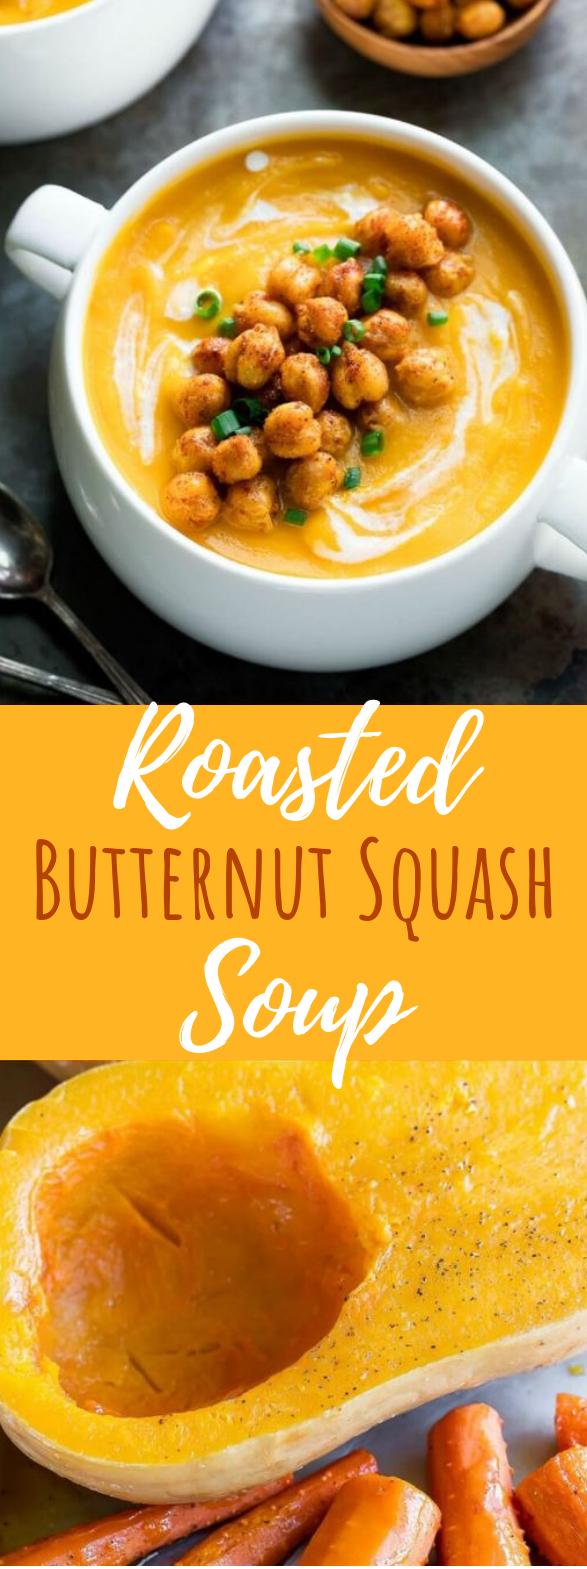 Roasted Butternut Squash Soup #vegetarian #dinner